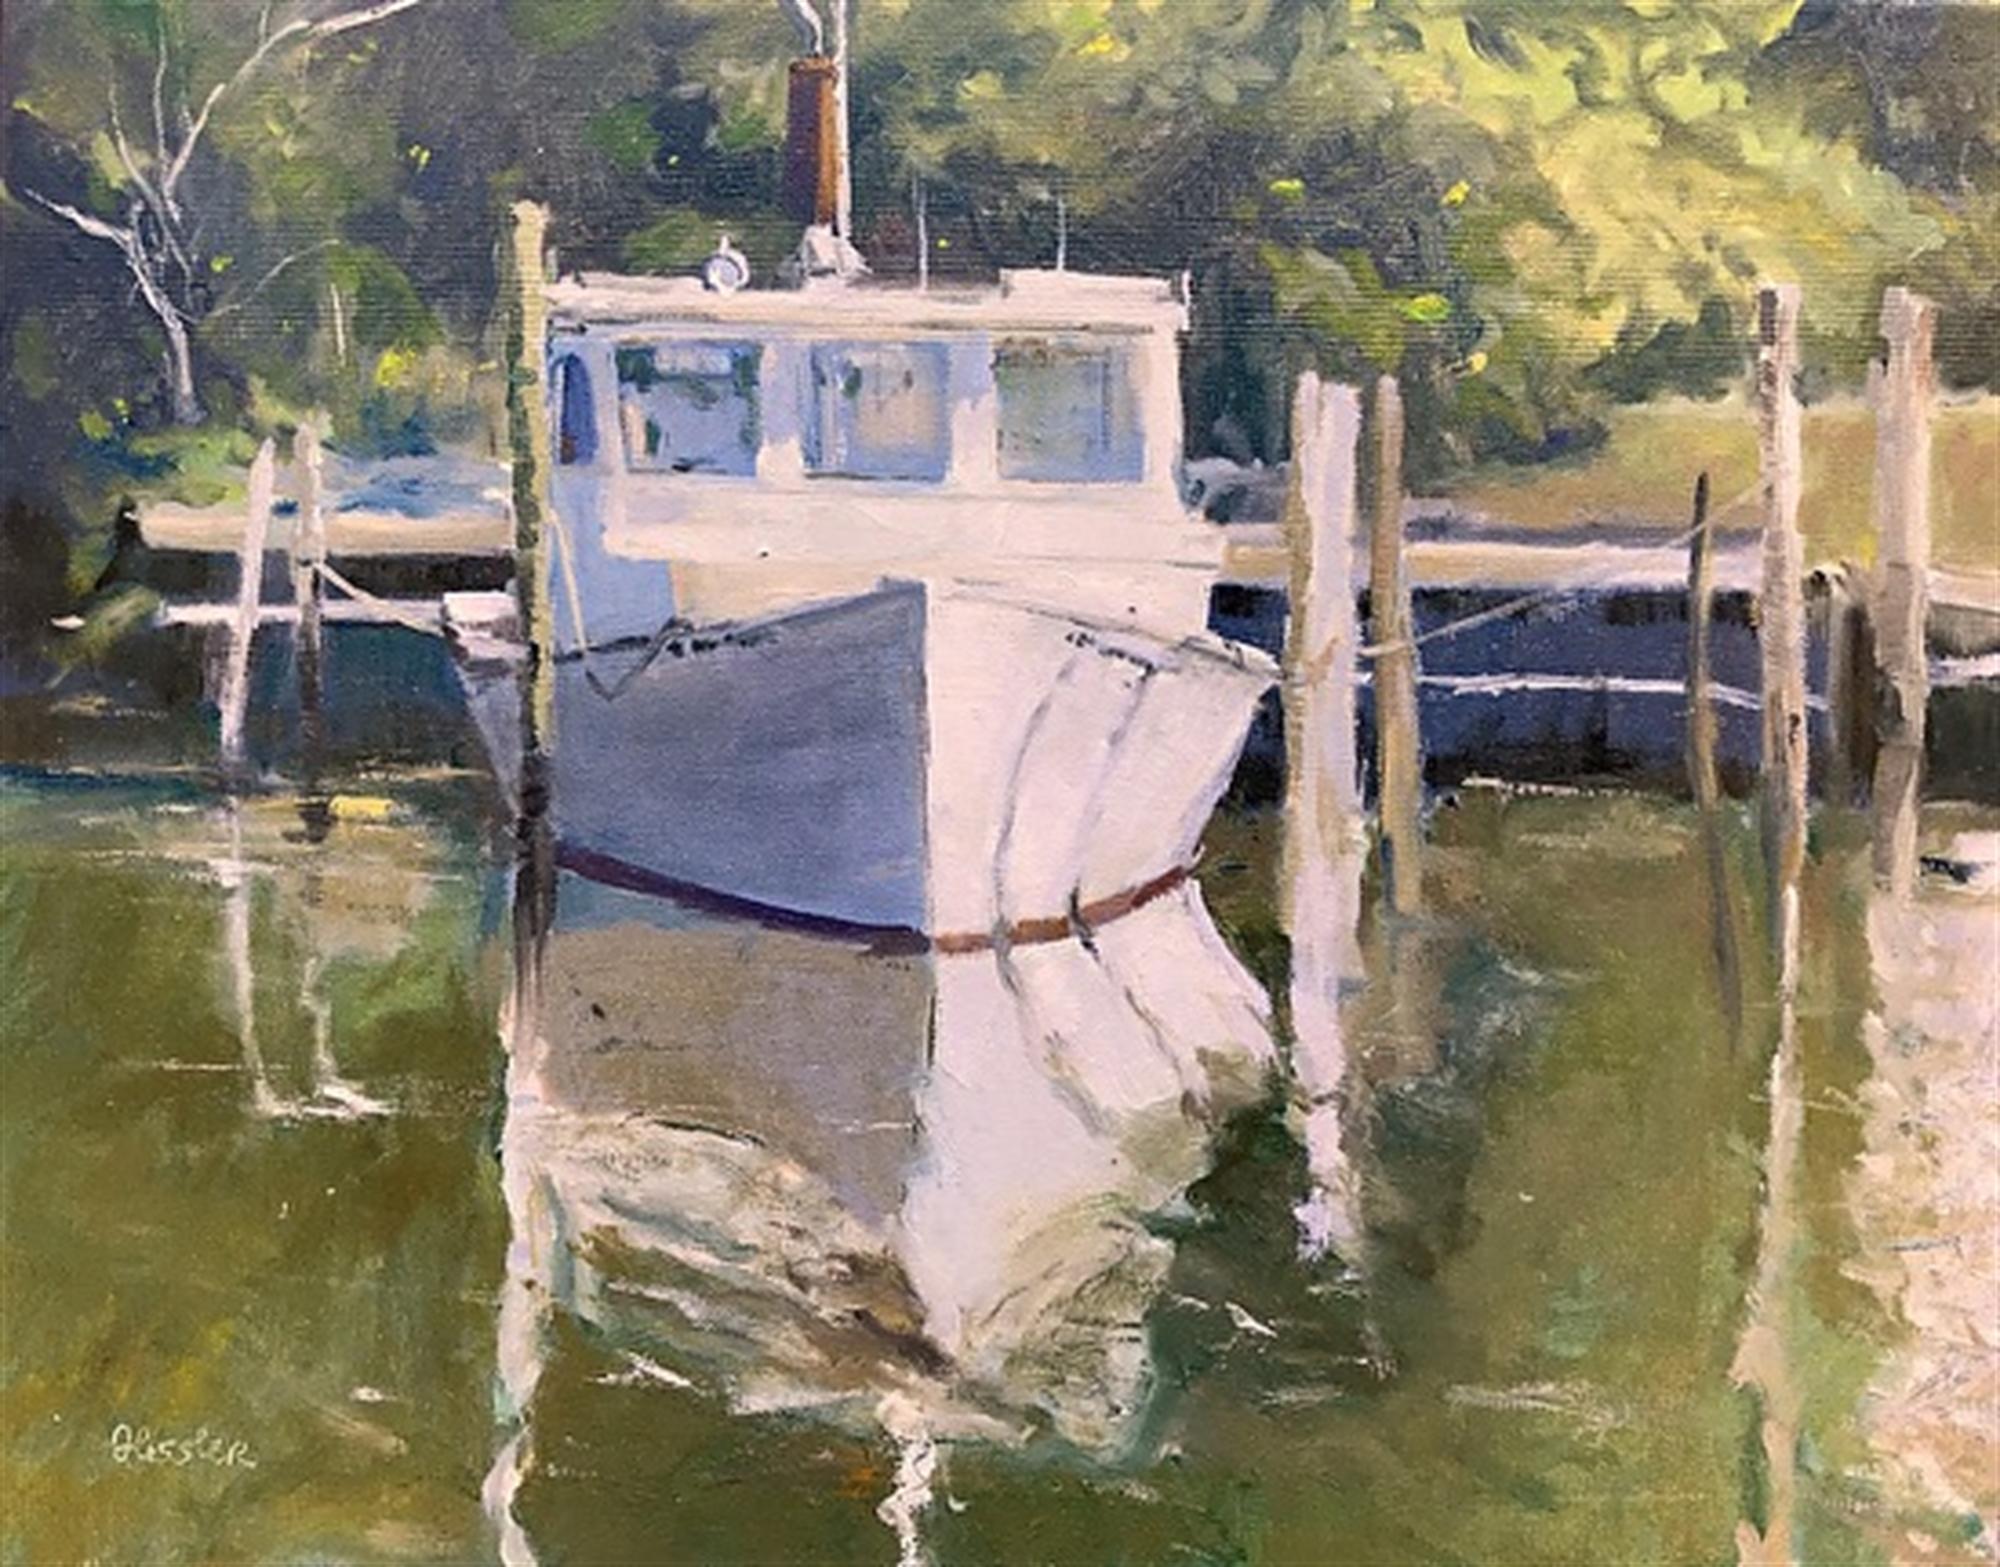 Shrimper, Davis, North Harbot by Steve Hessler